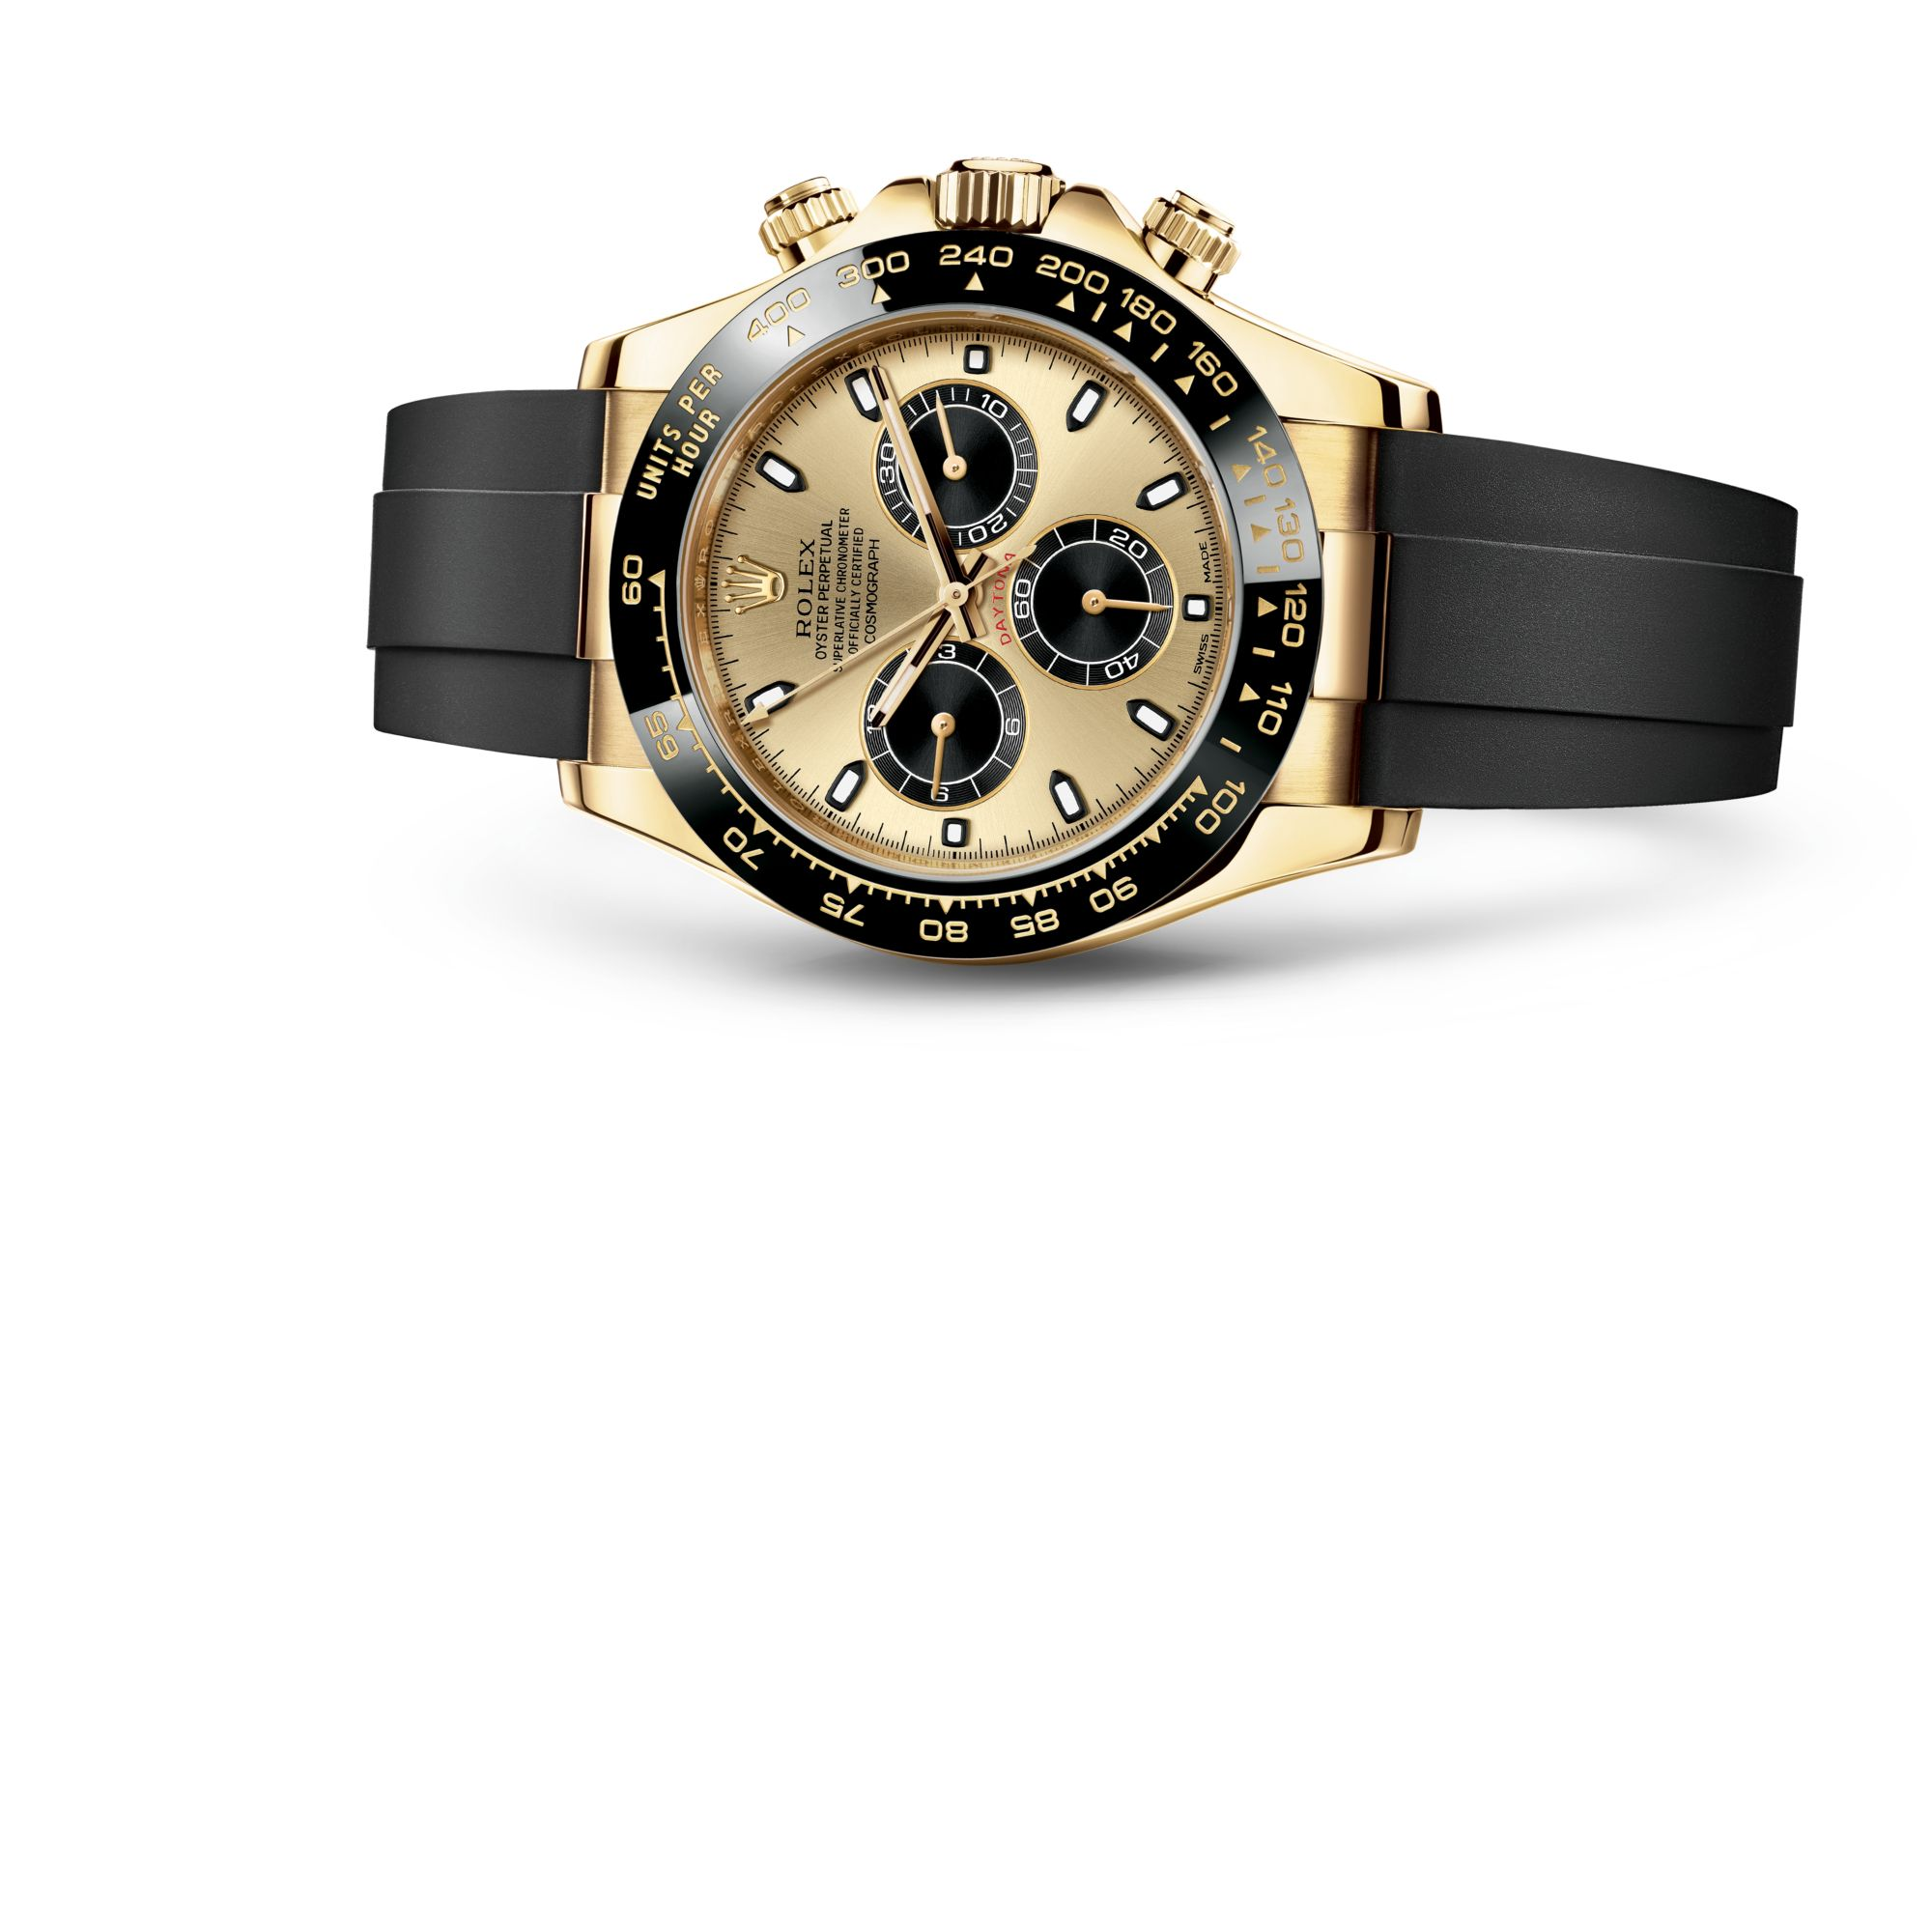 Rolex Cosmograph Daytona M116518LN-0040